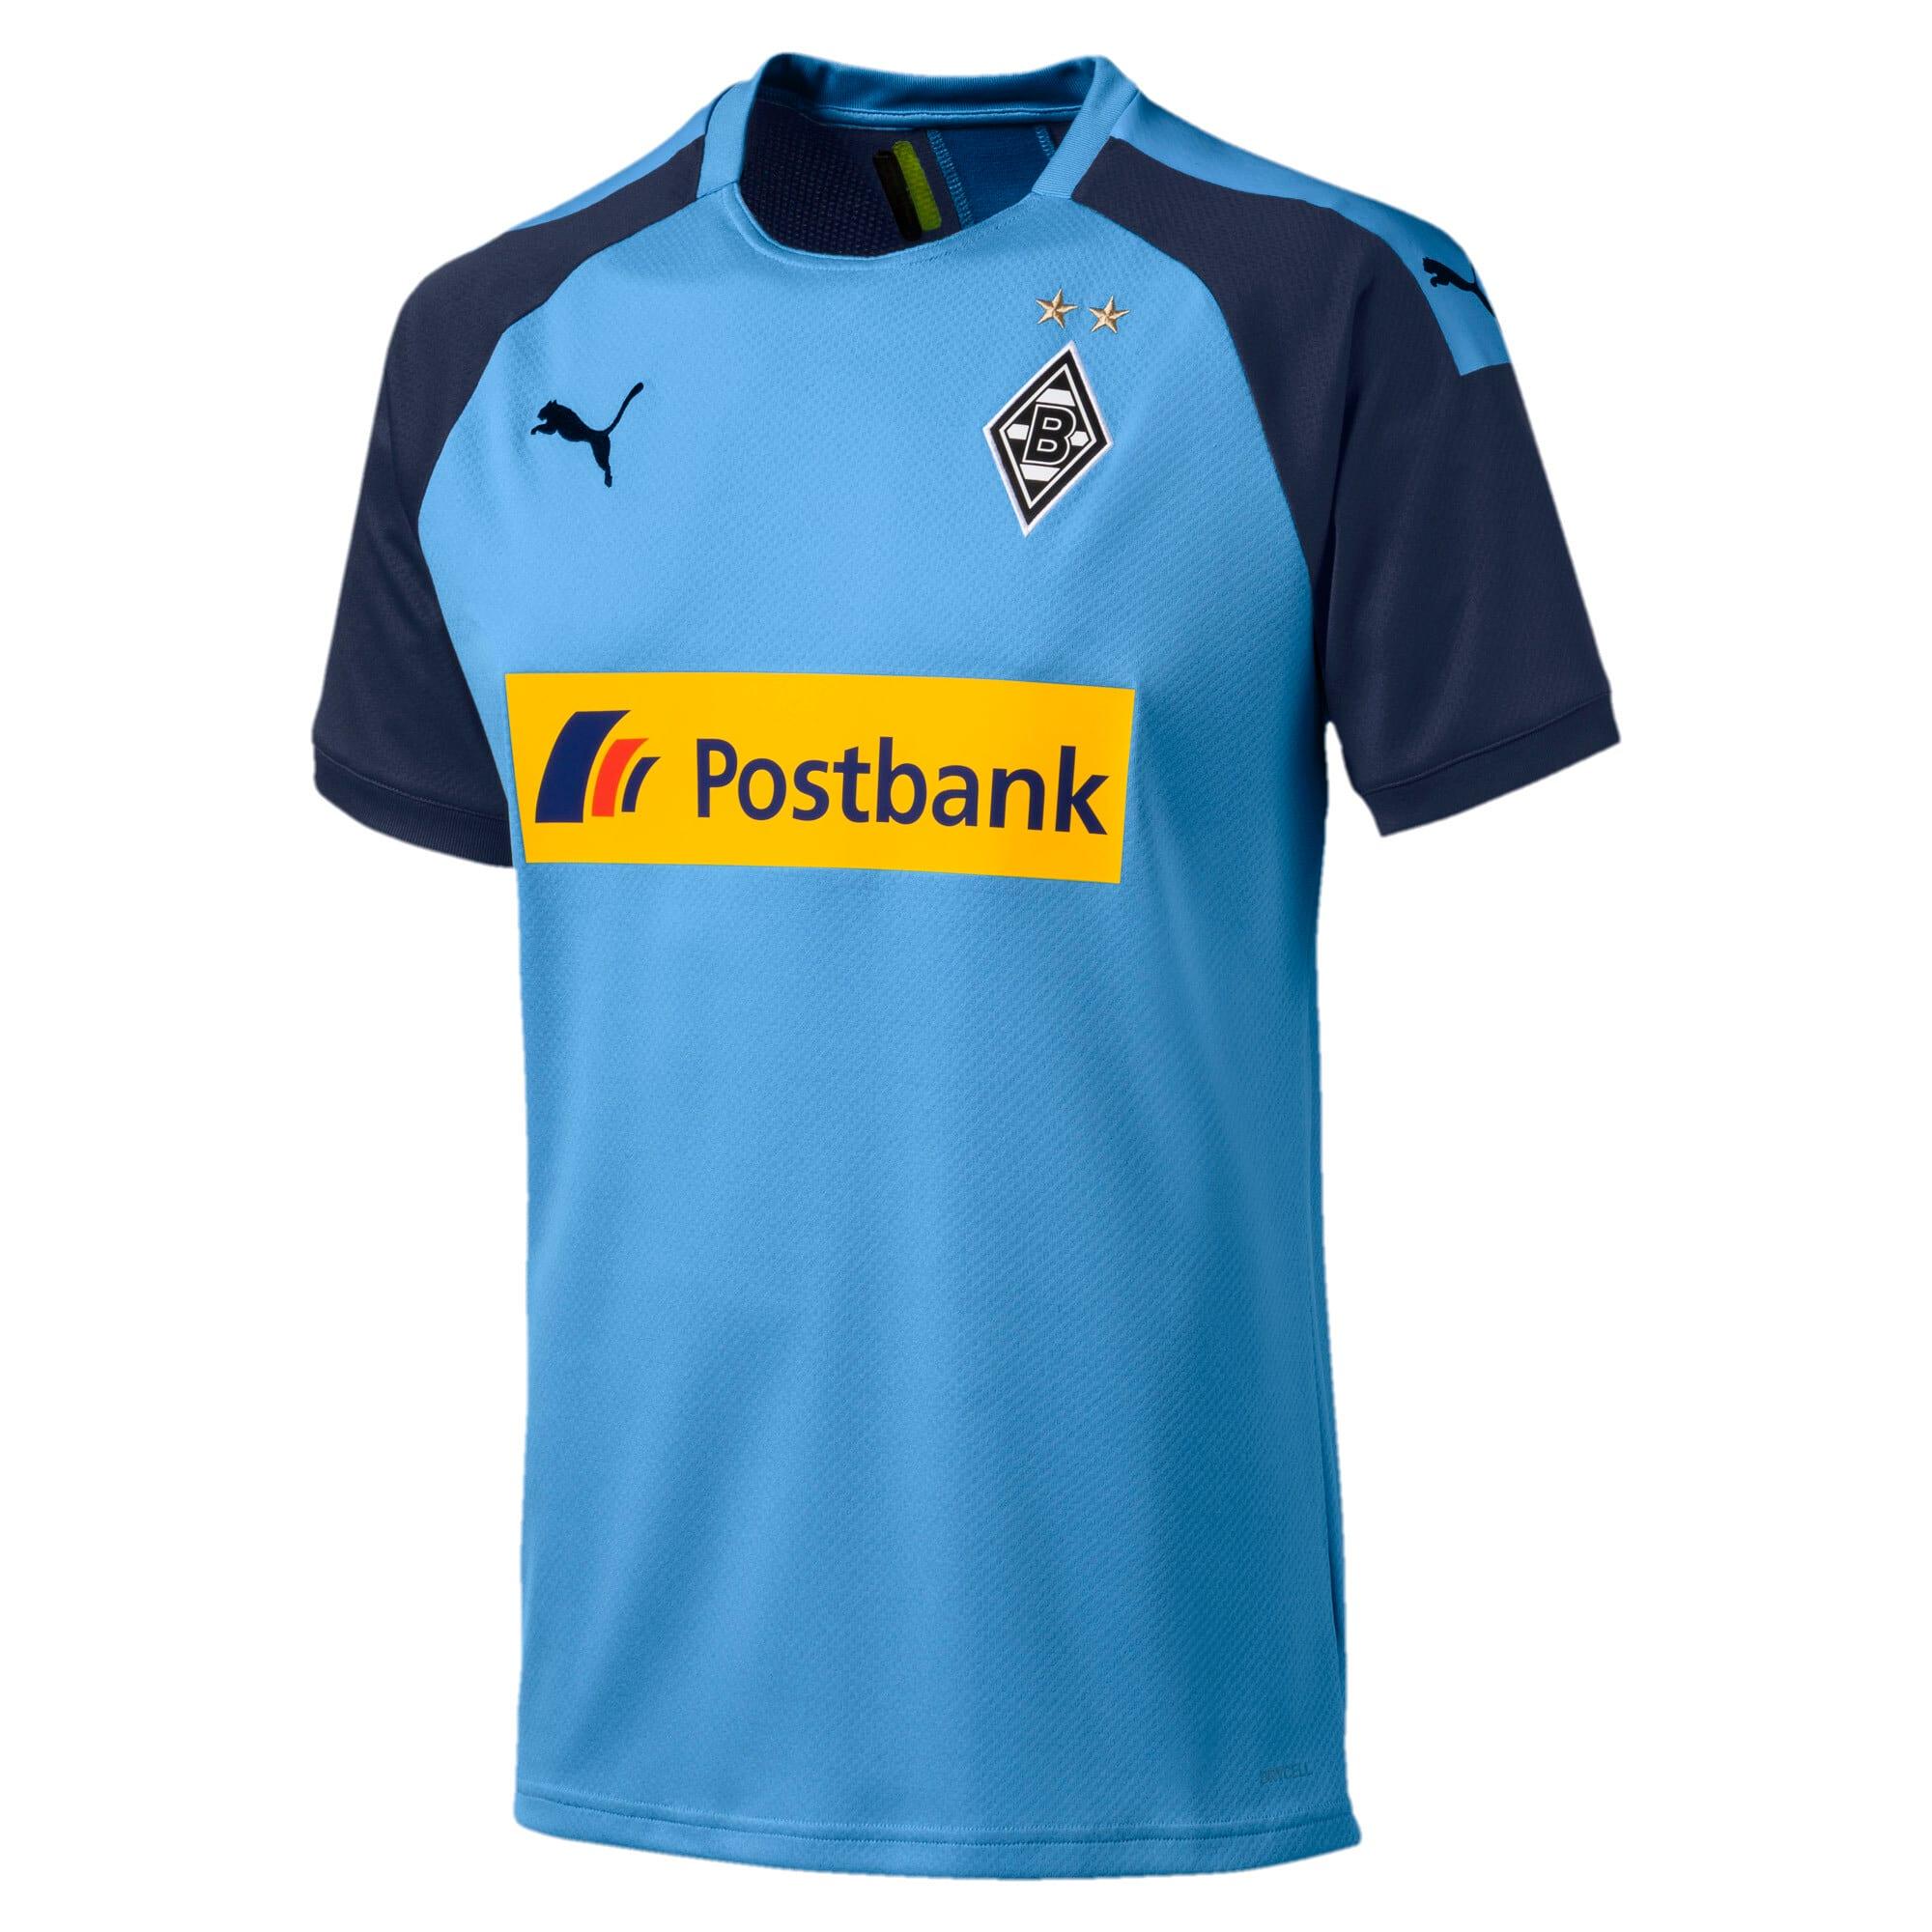 Thumbnail 1 of Borussia Mönchengladbach Men's Away Replica Jersey, Team Light Blue-Peacoat, medium